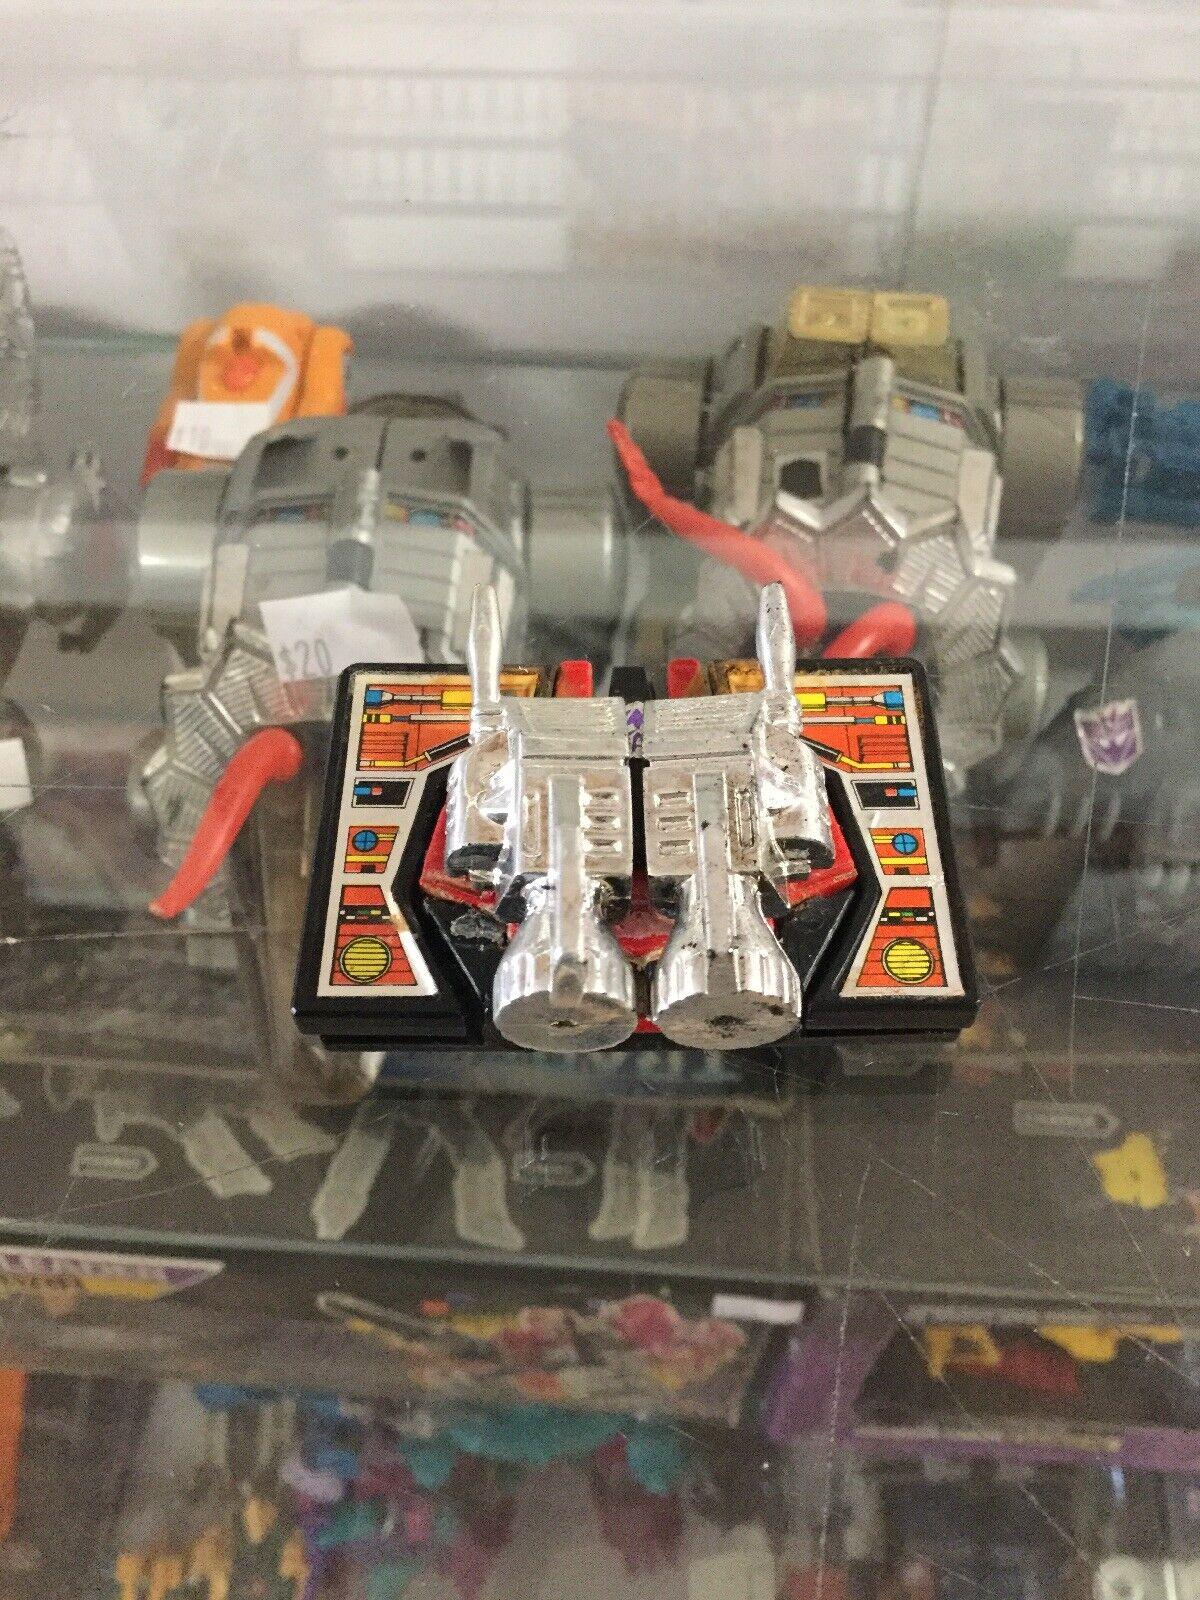 Laserbeak MINT 100% completare 1985 Vintage Hasbro G1  Transformers azione cifra  garanzia di qualità